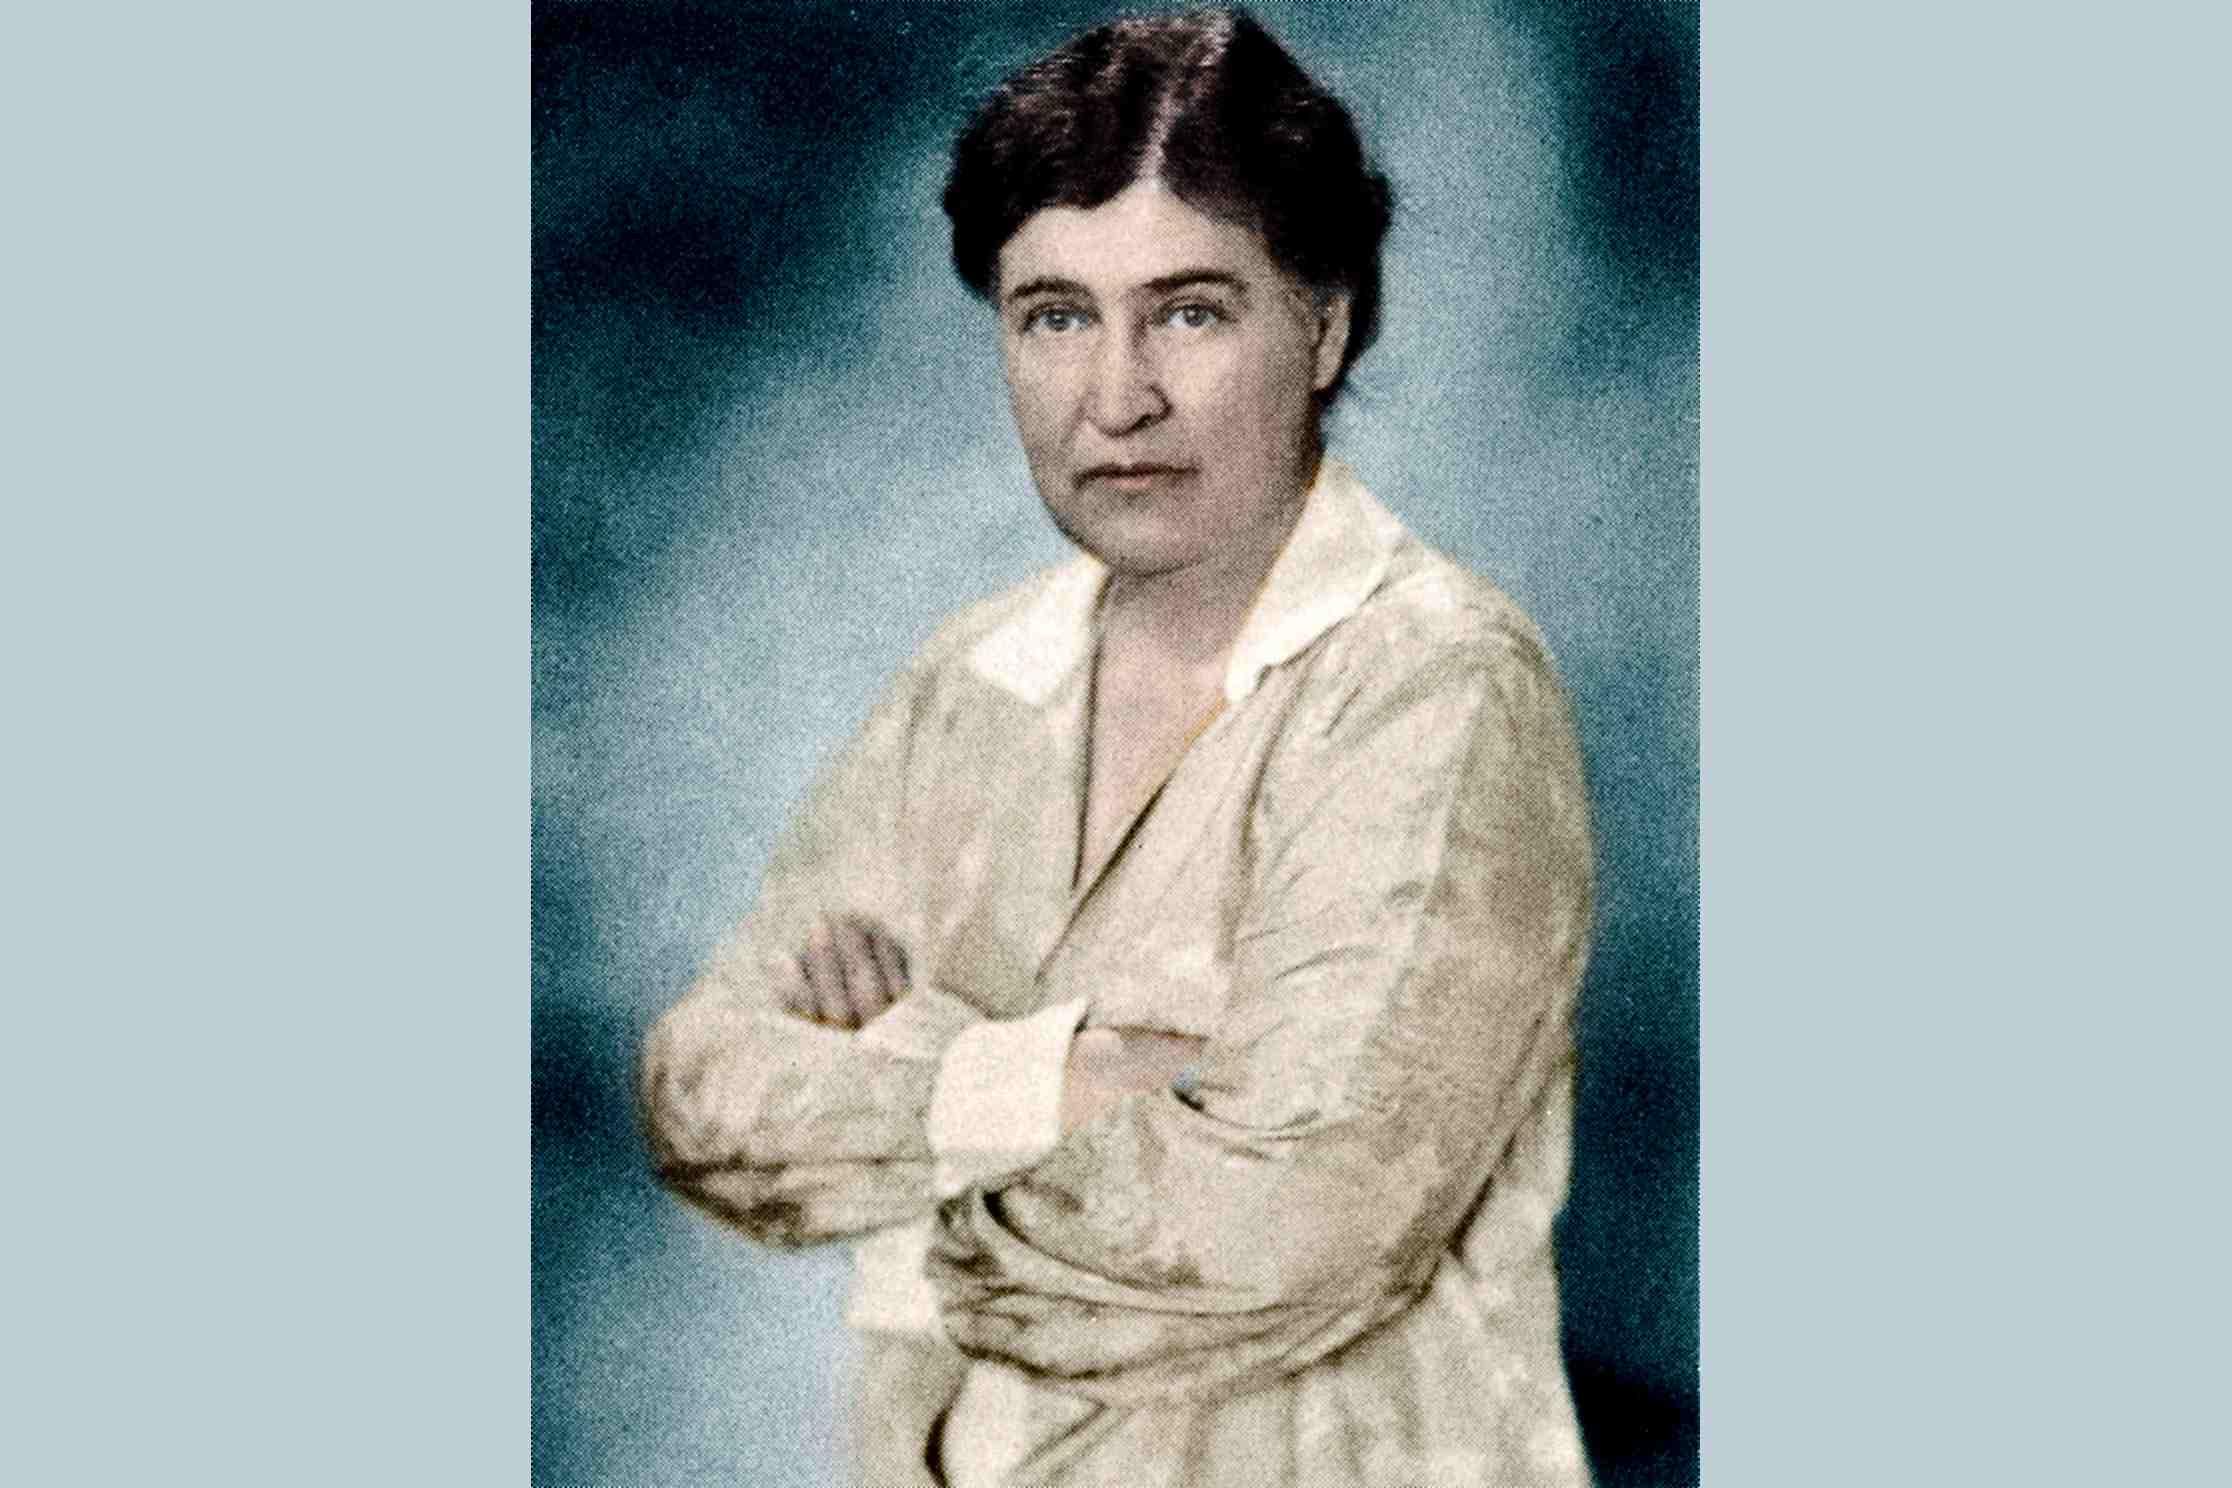 Willa Sibert Cather, 1920s